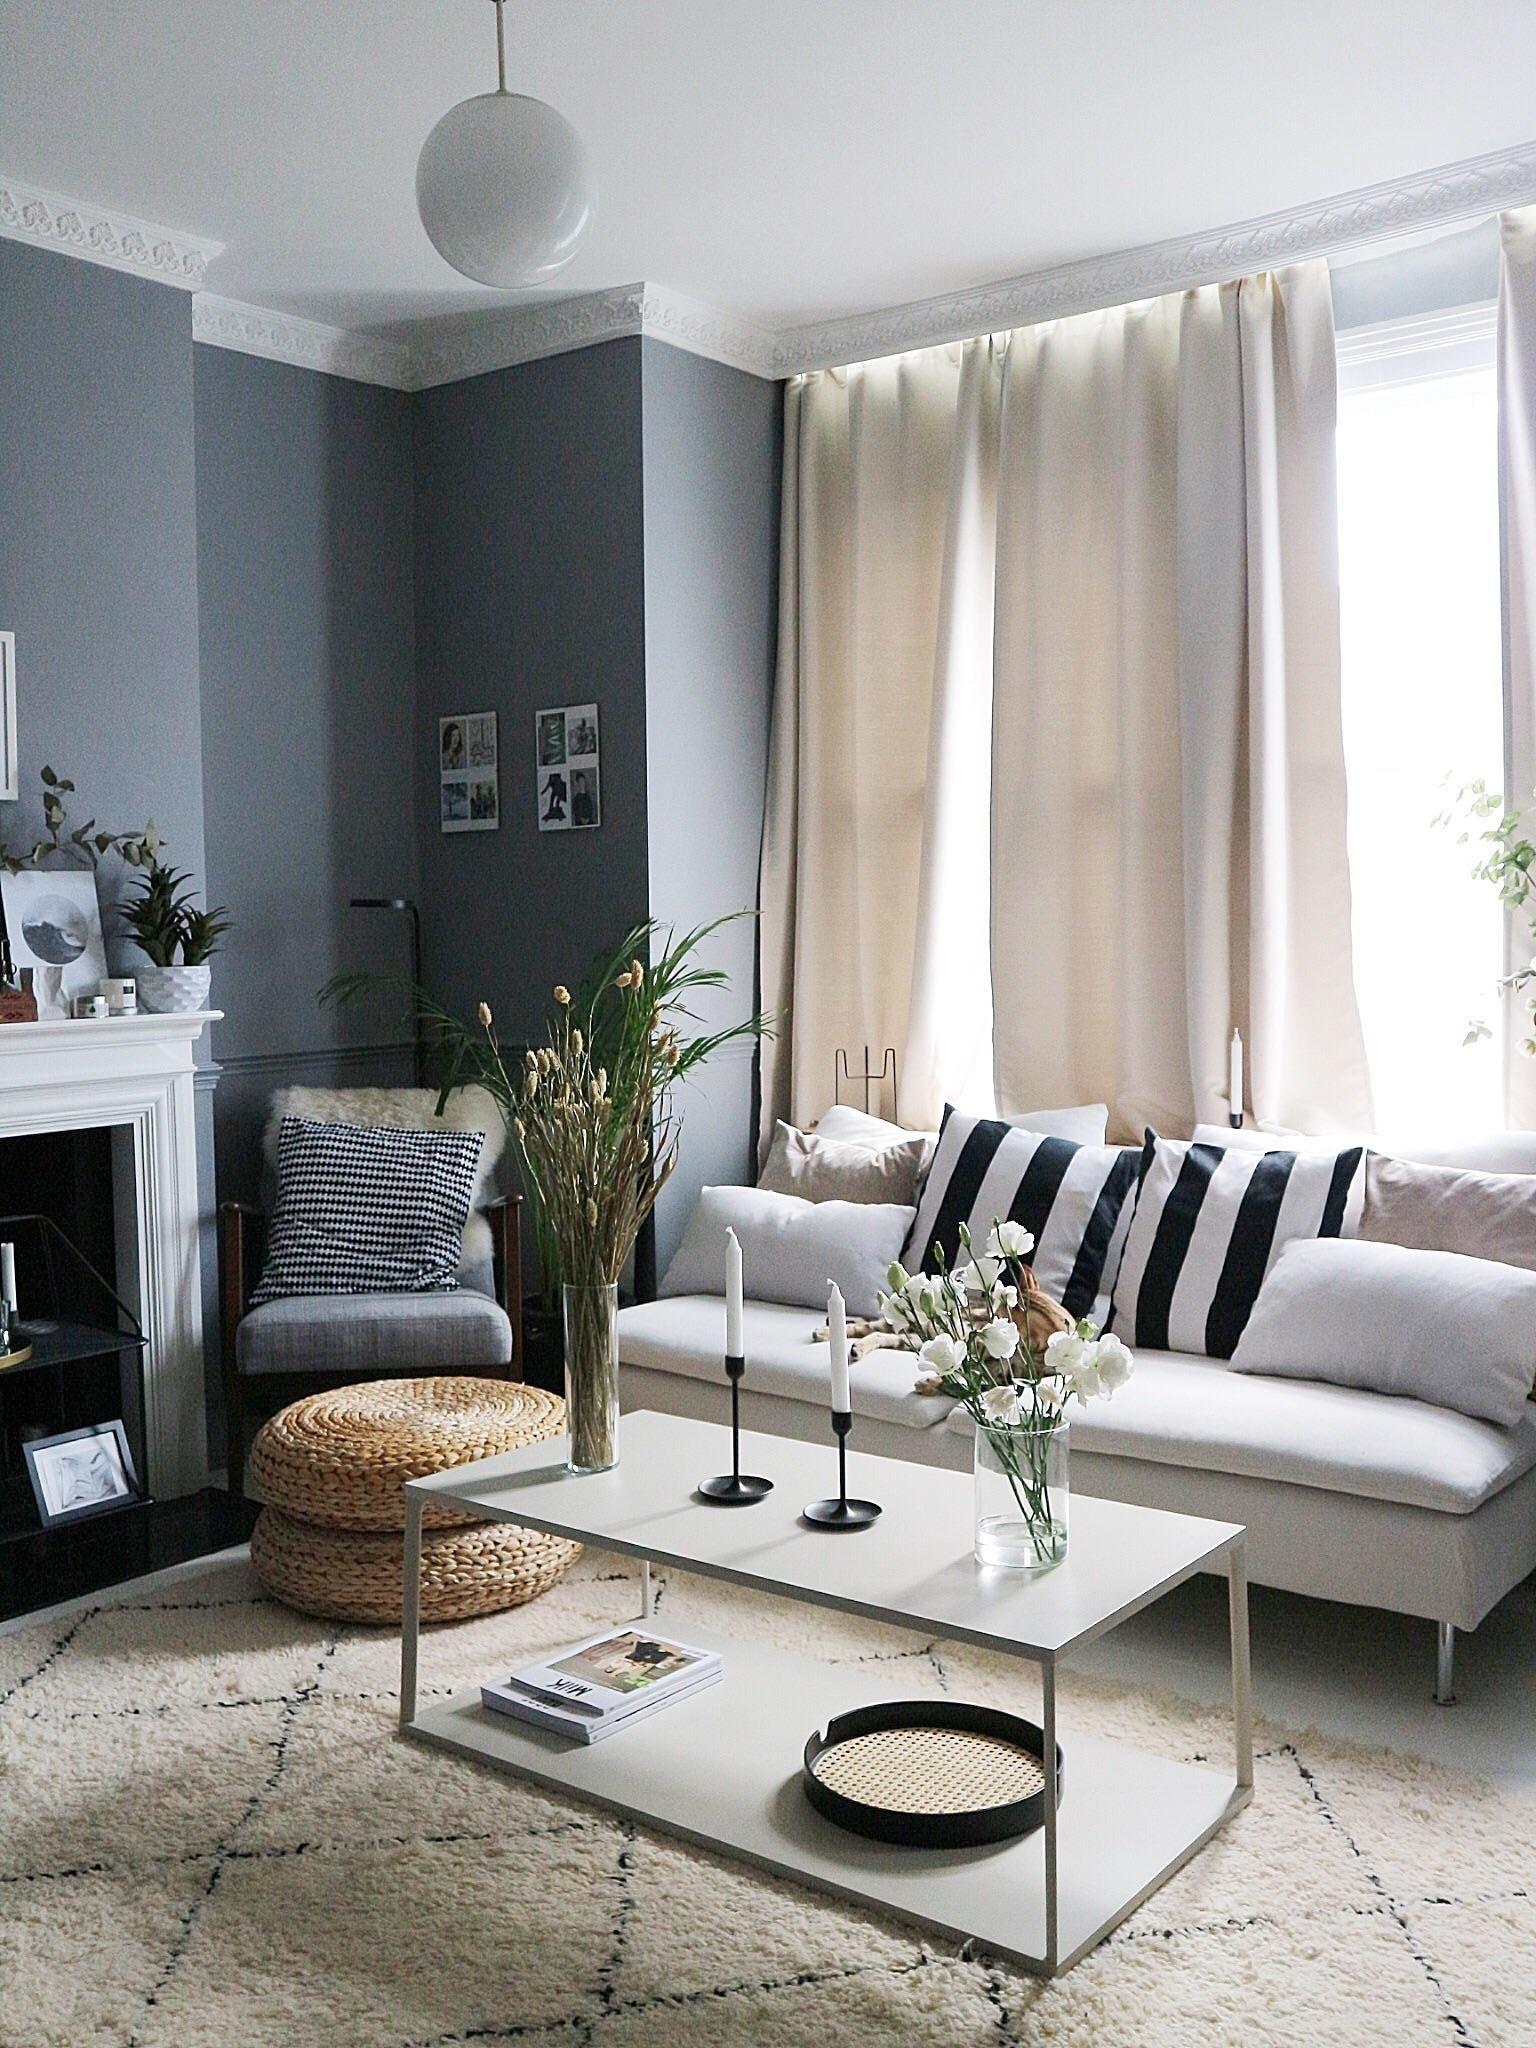 My Modern Victorian Living Room - London UK | London ...